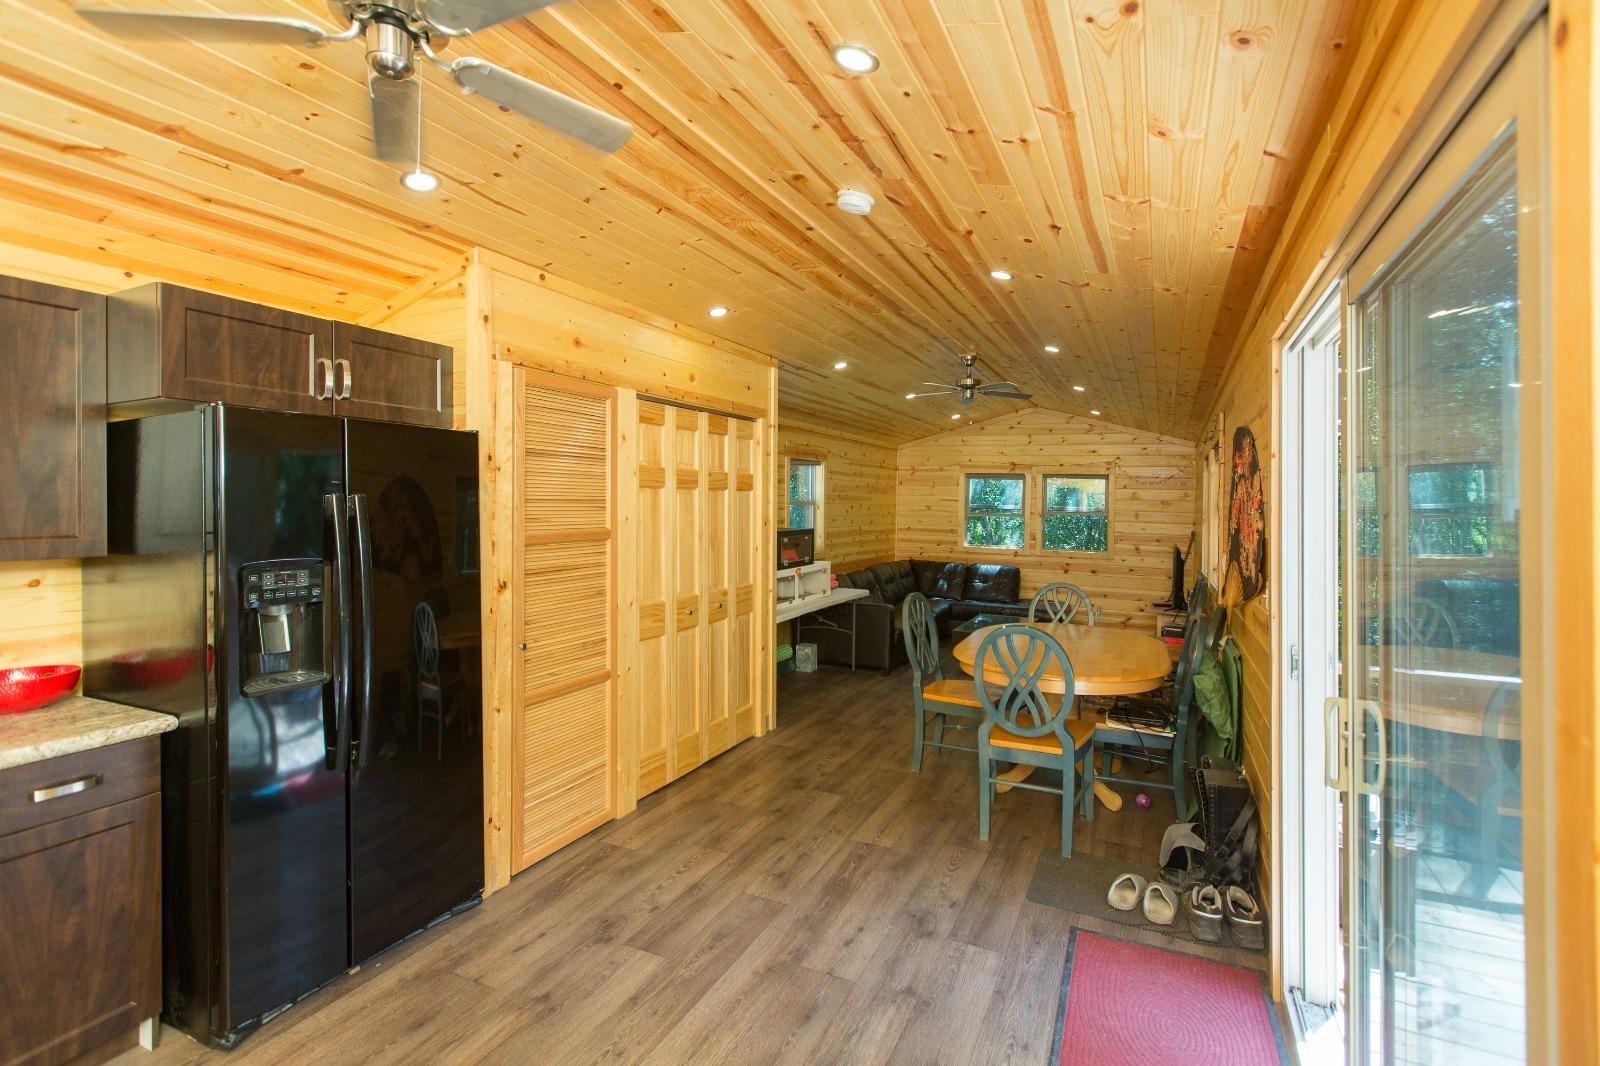 Staff accommodations - lounge interior